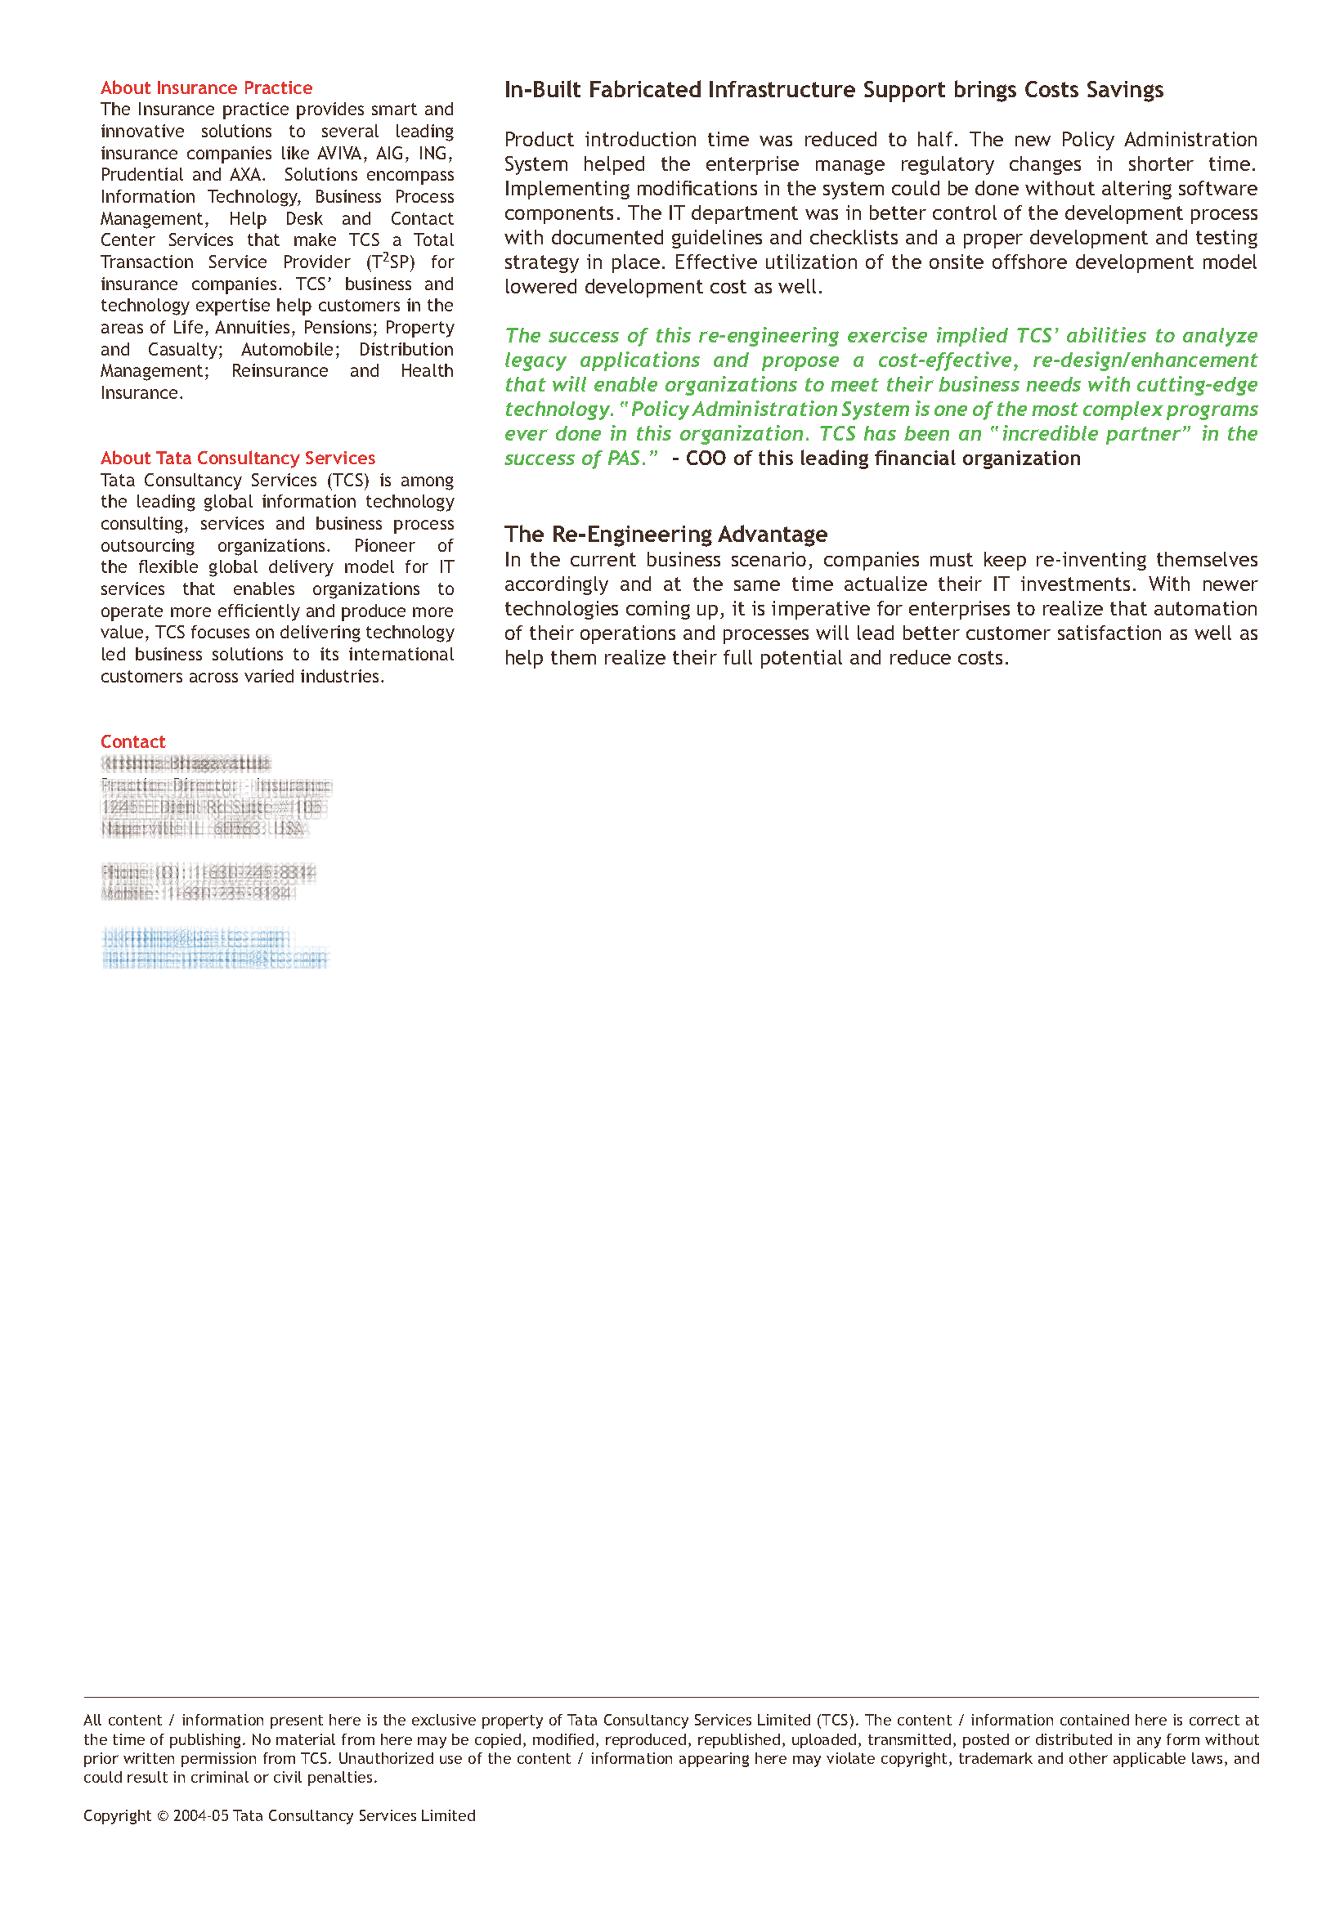 TCS Marketing Collateral - Bhooshan Pandya - Design Thinker